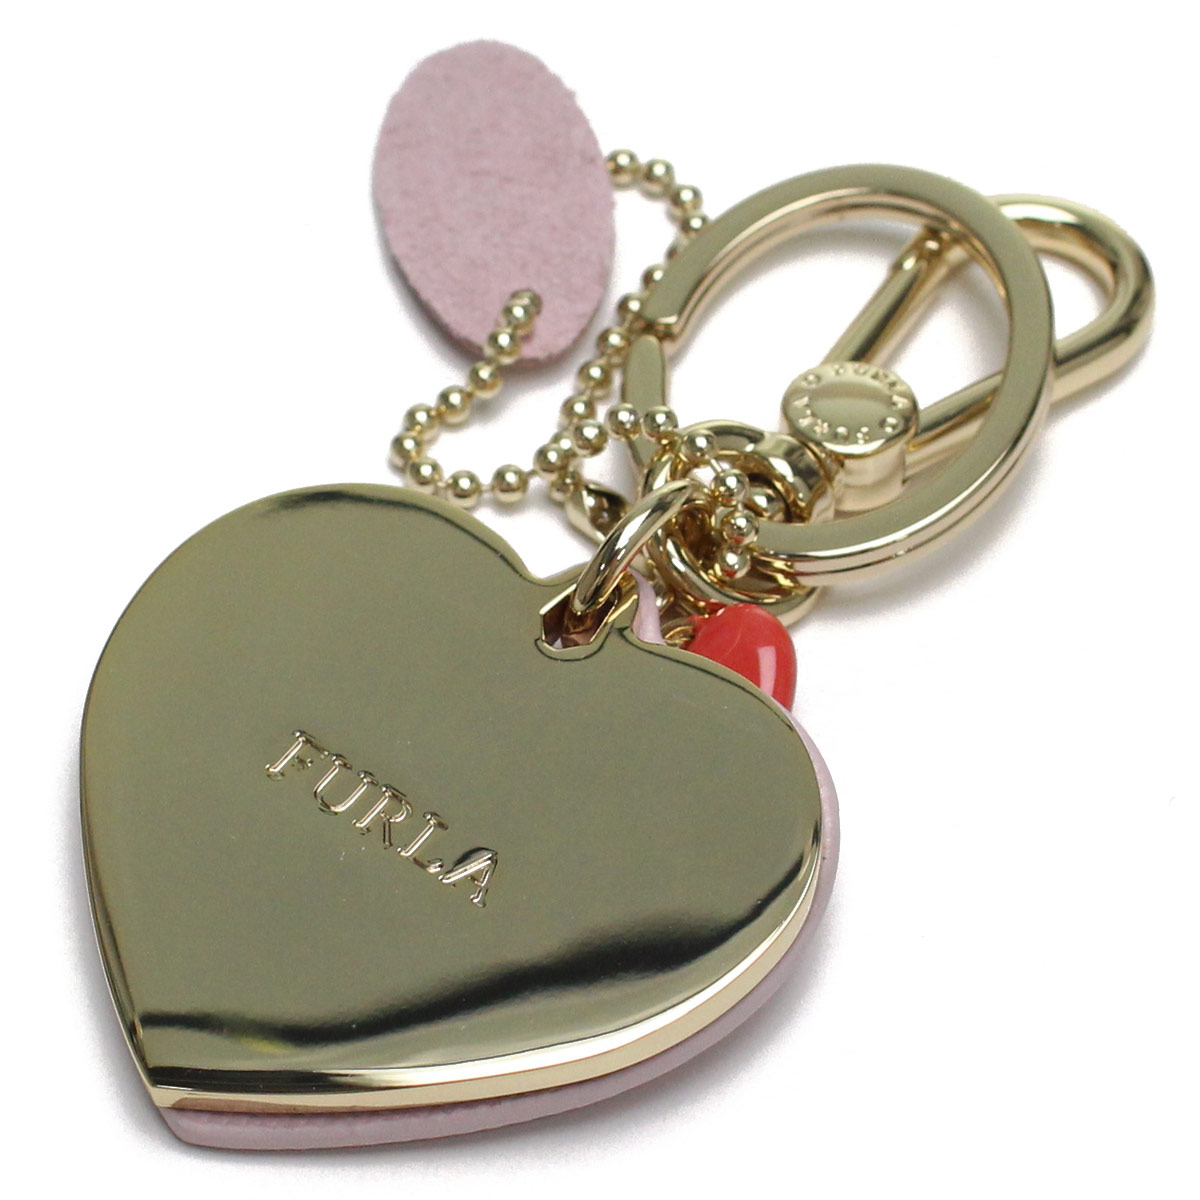 ca5a86dd4b4dfd Bighit The total brand wholesale  フルラ FURLA VENUS Venus heart key ...